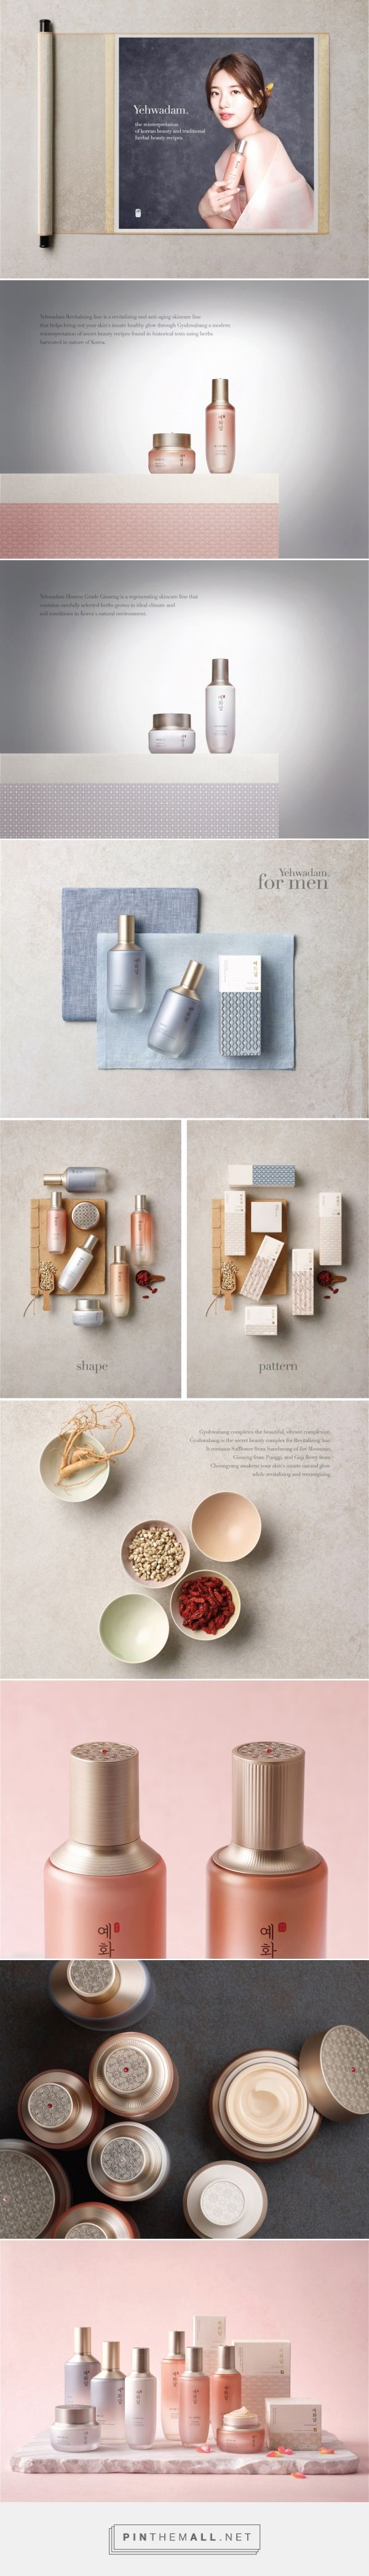 Yehwadam  Faceshop - Packaging of the World - Creative Package Design Gallery - http://www.packagingoftheworld.com/2016/12/yehwadam.html